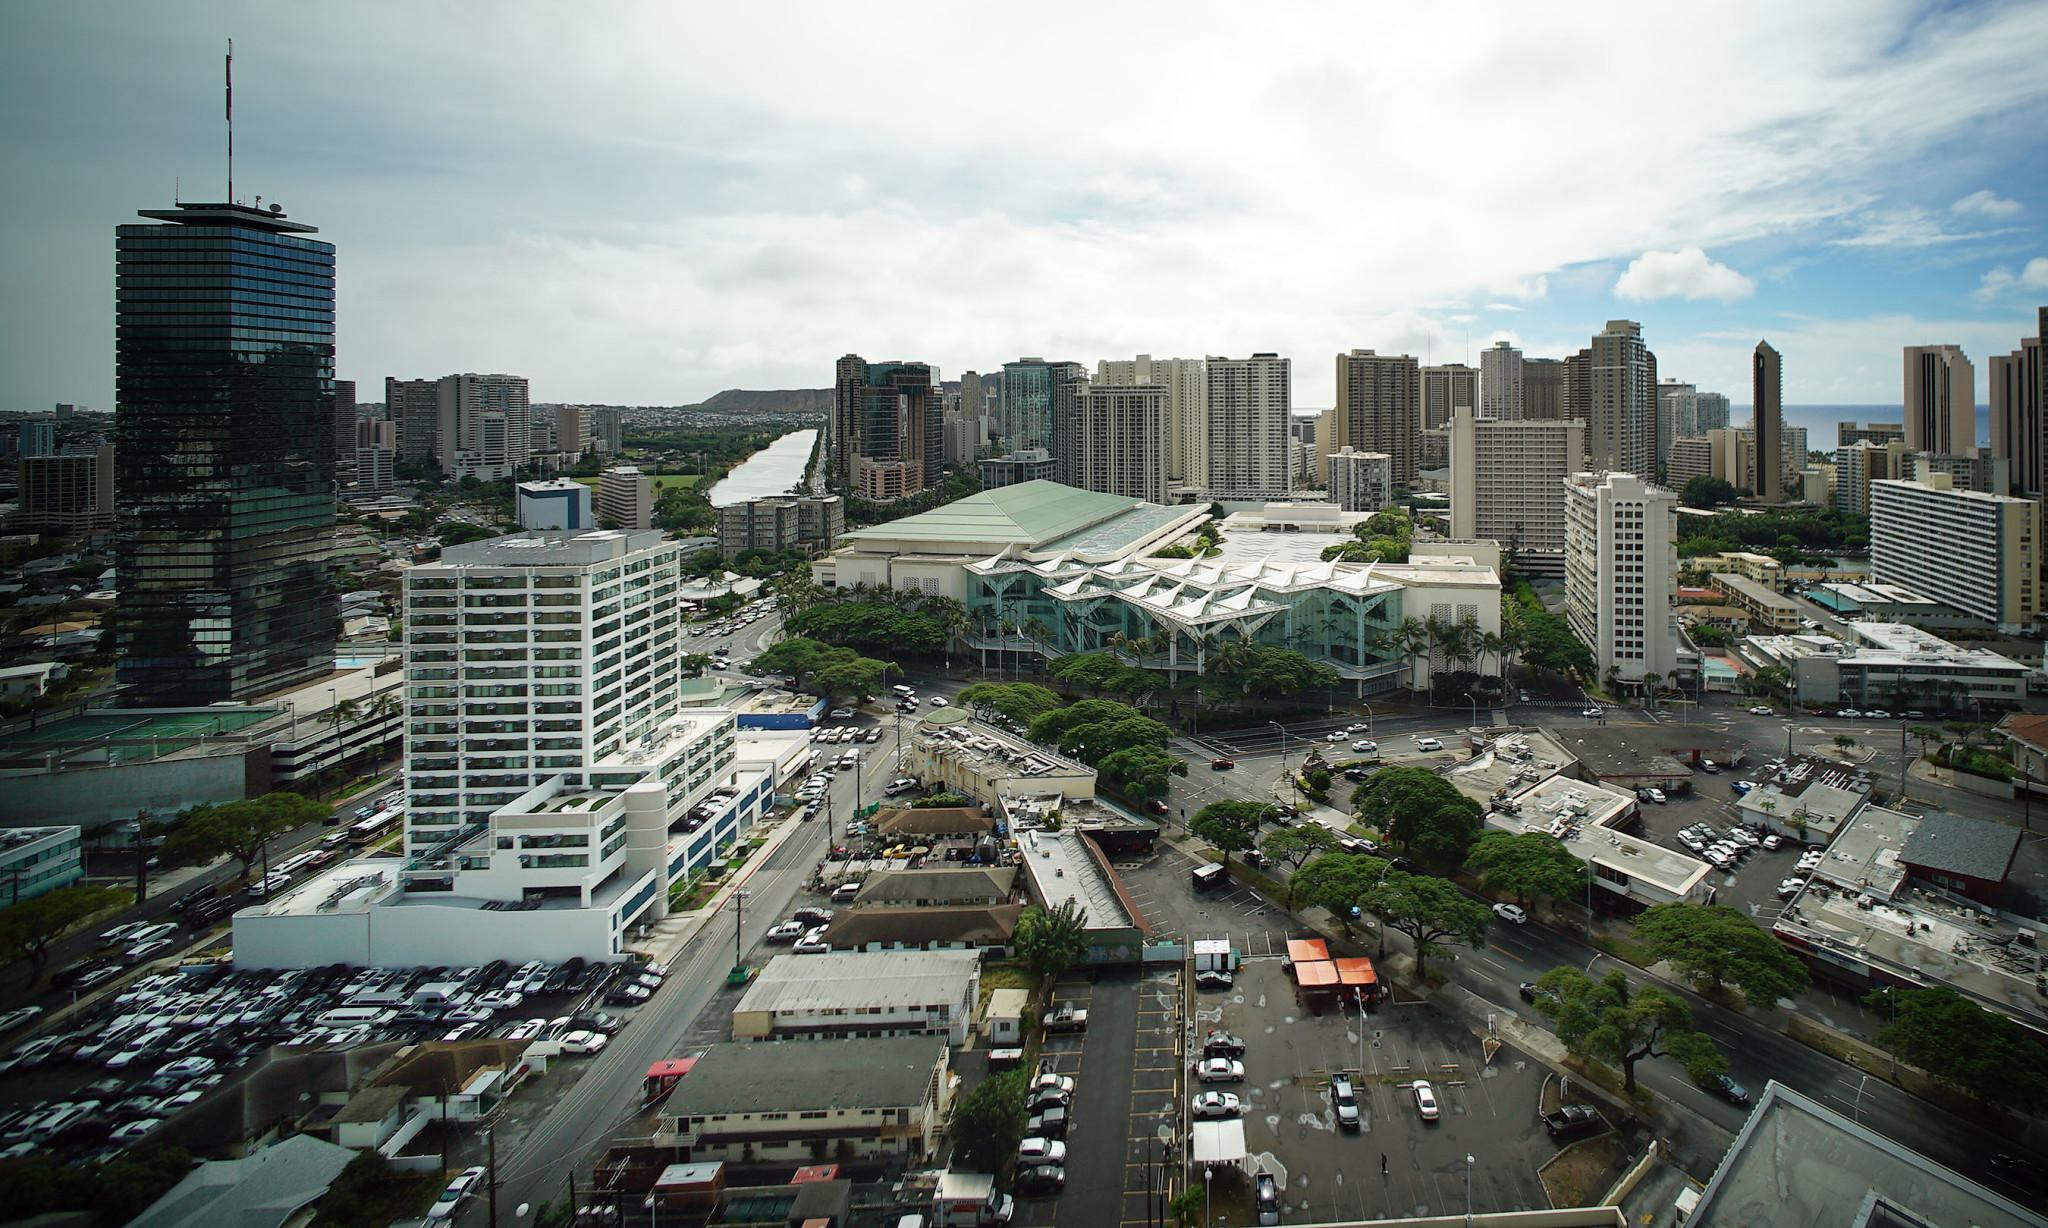 Convention Center Kapiolani Boulevard Waikiki Century Center2. 19 nov 2016